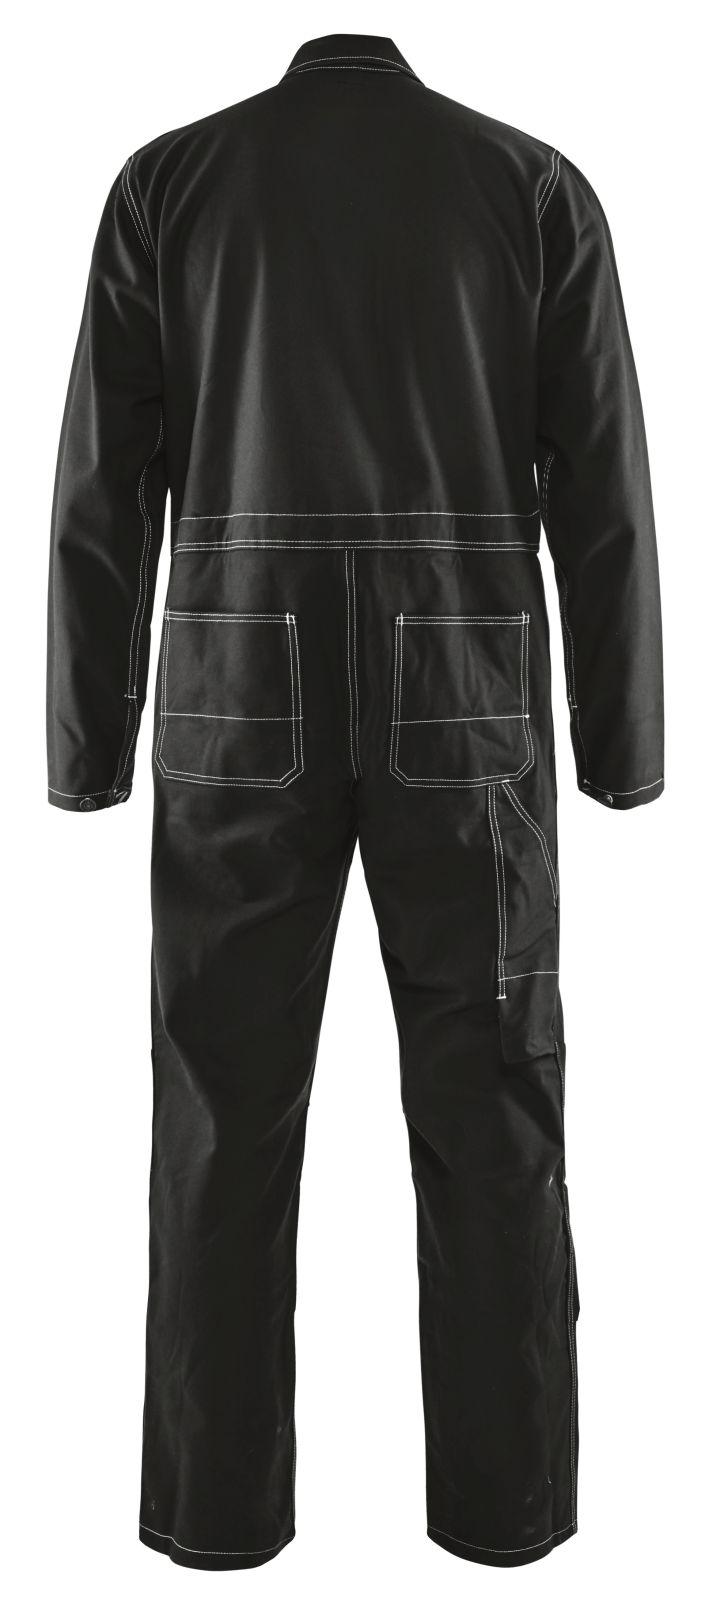 Blaklader Overalls 61511370 zwart(9900)